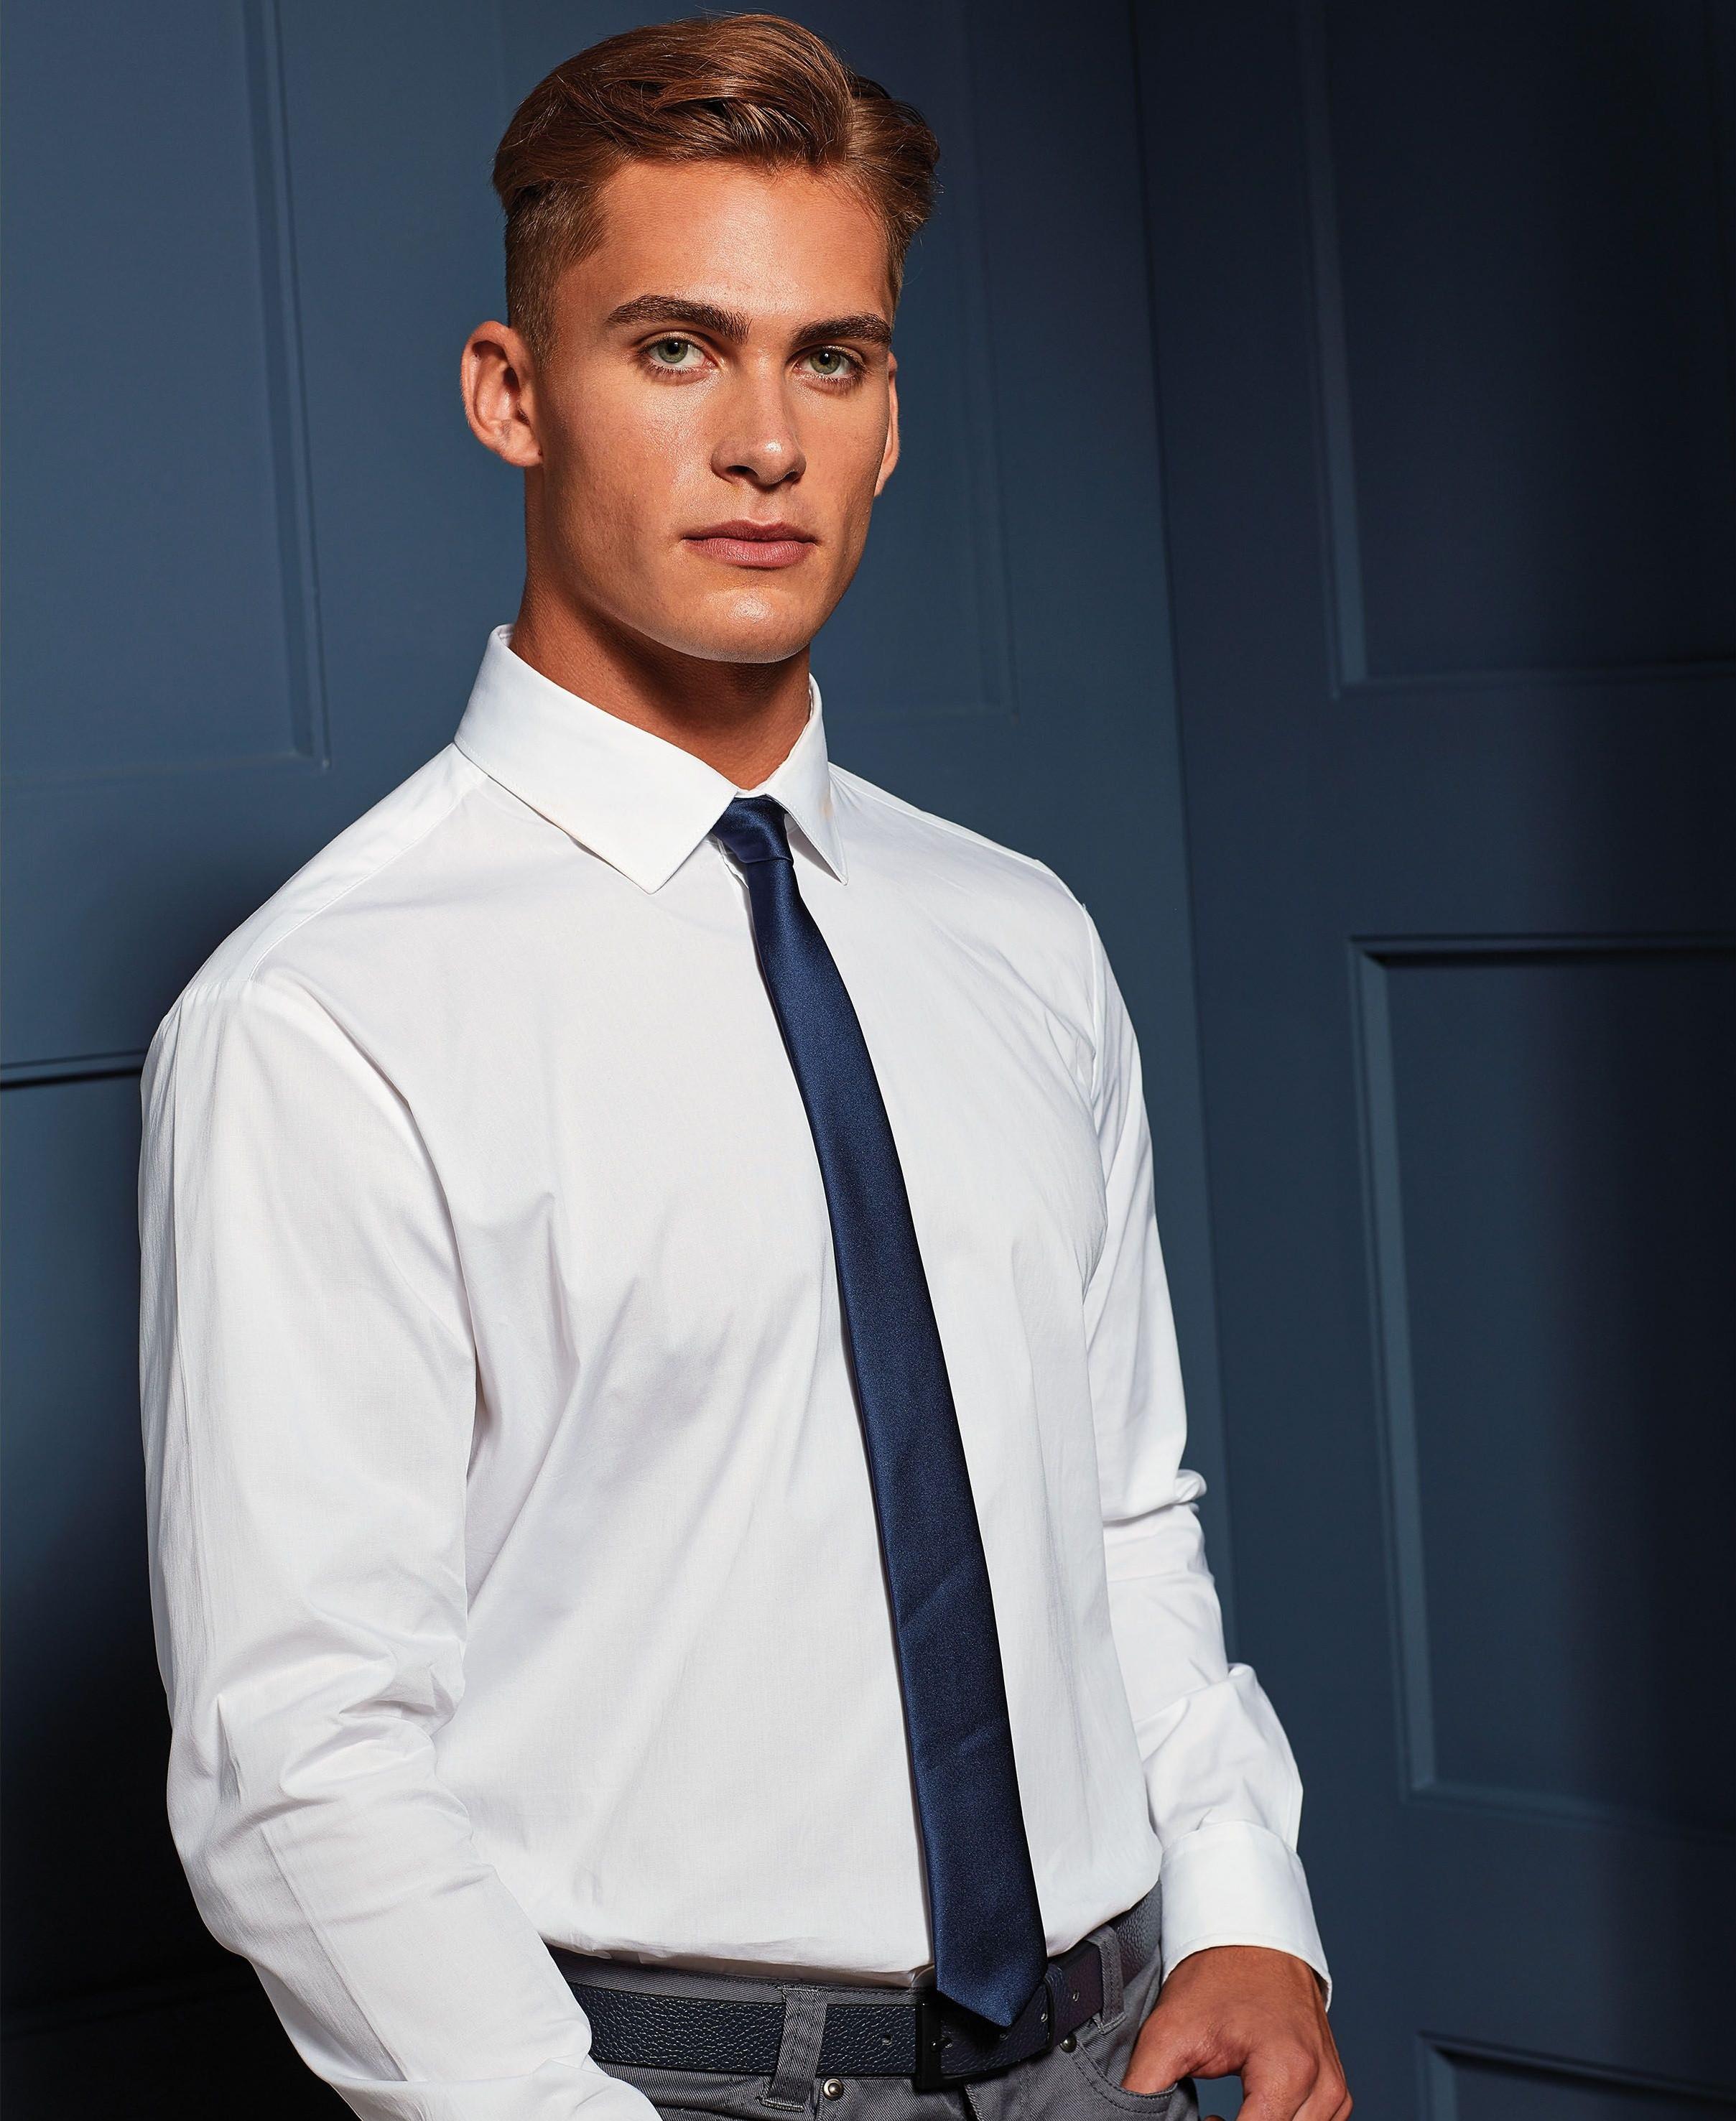 Cravate personnalisée | Mes Tenues Perso